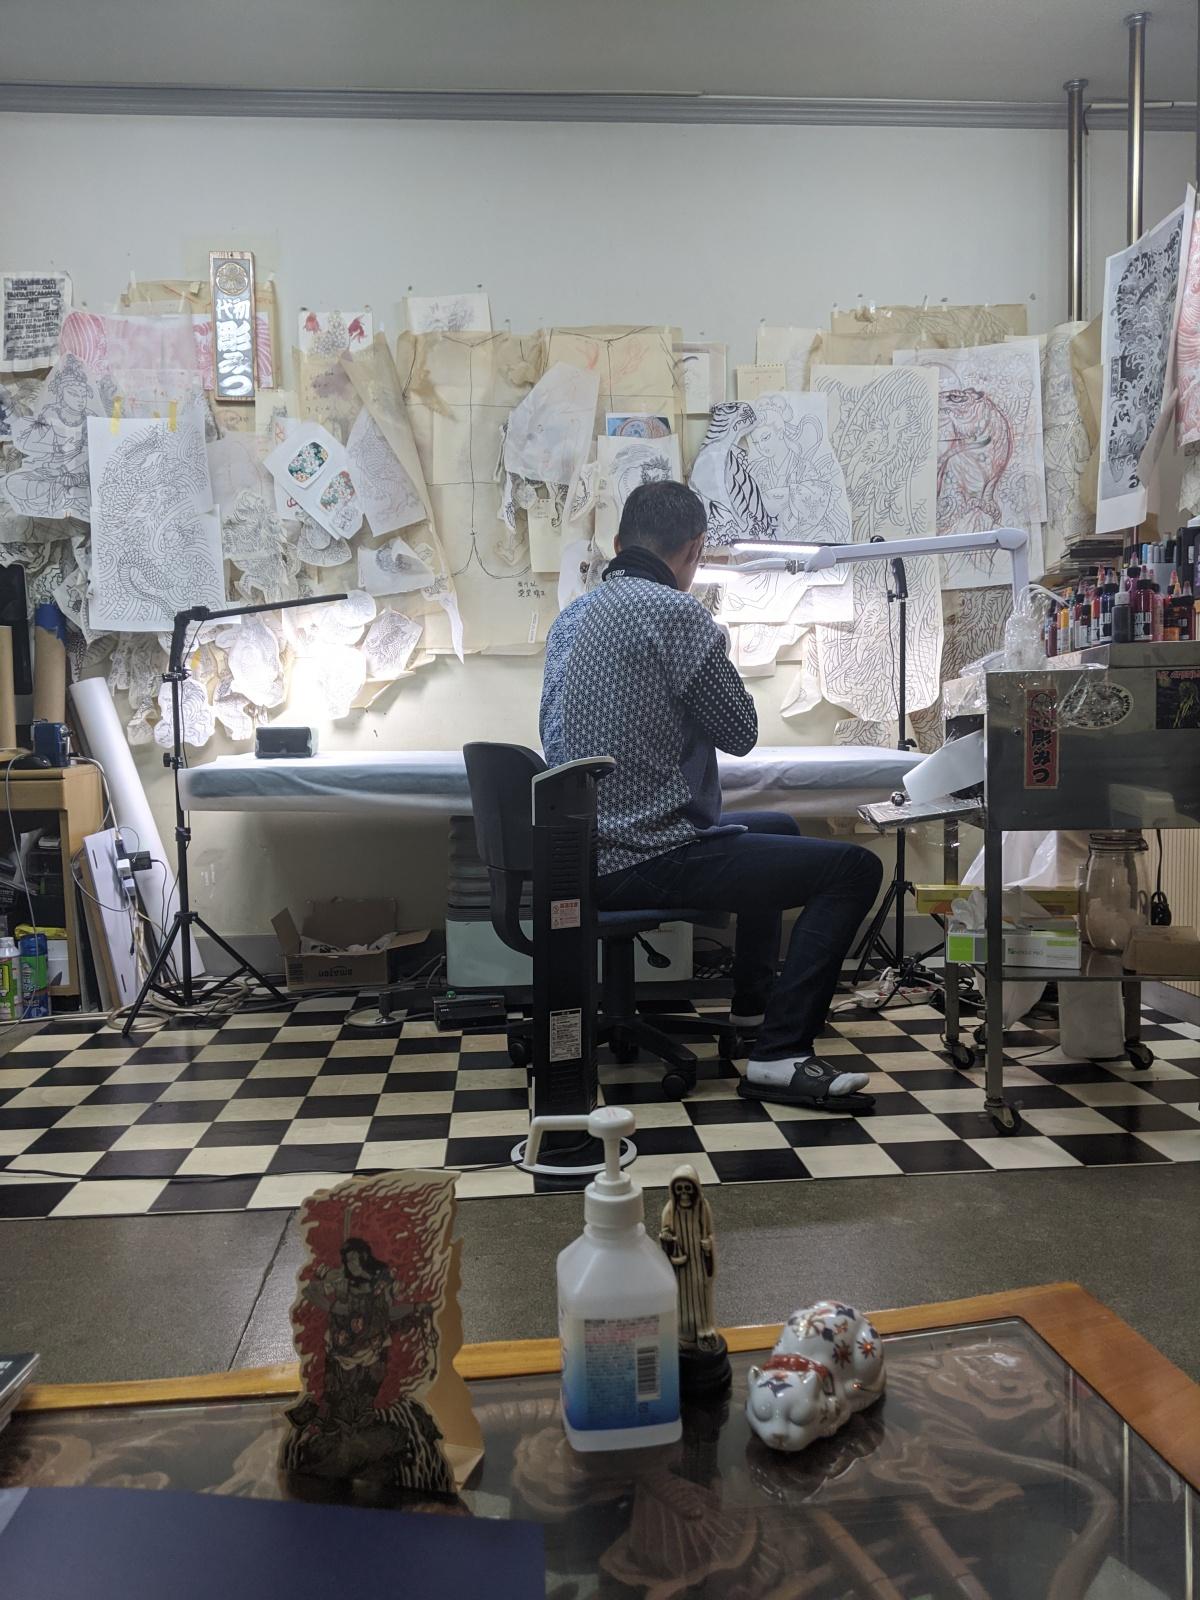 Tokyo Memories Day 10: Tebori Handpoke Tattoo withHorimitsu